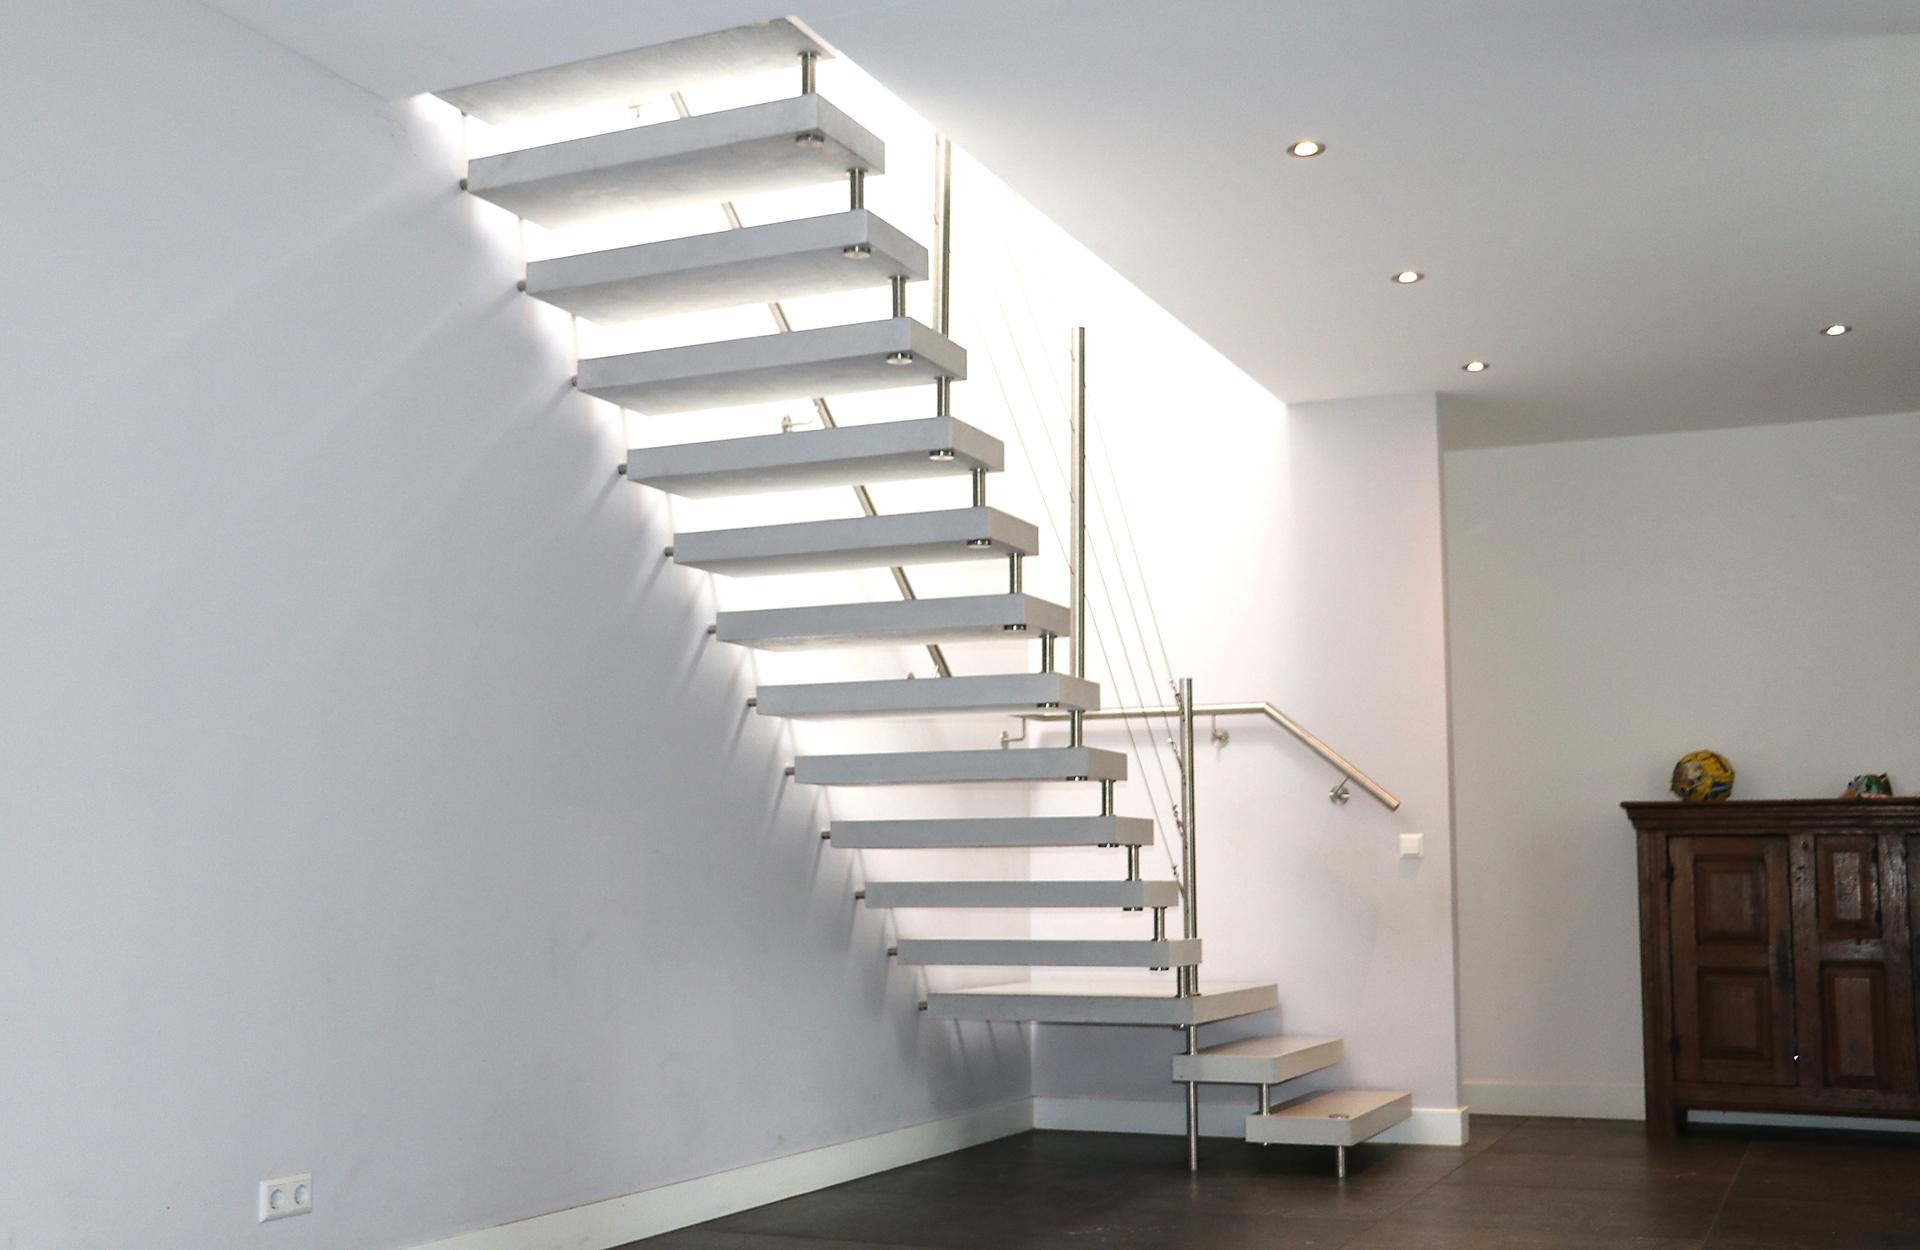 Betonnen Trap Voorbeelden : Betonnen trap ecosia